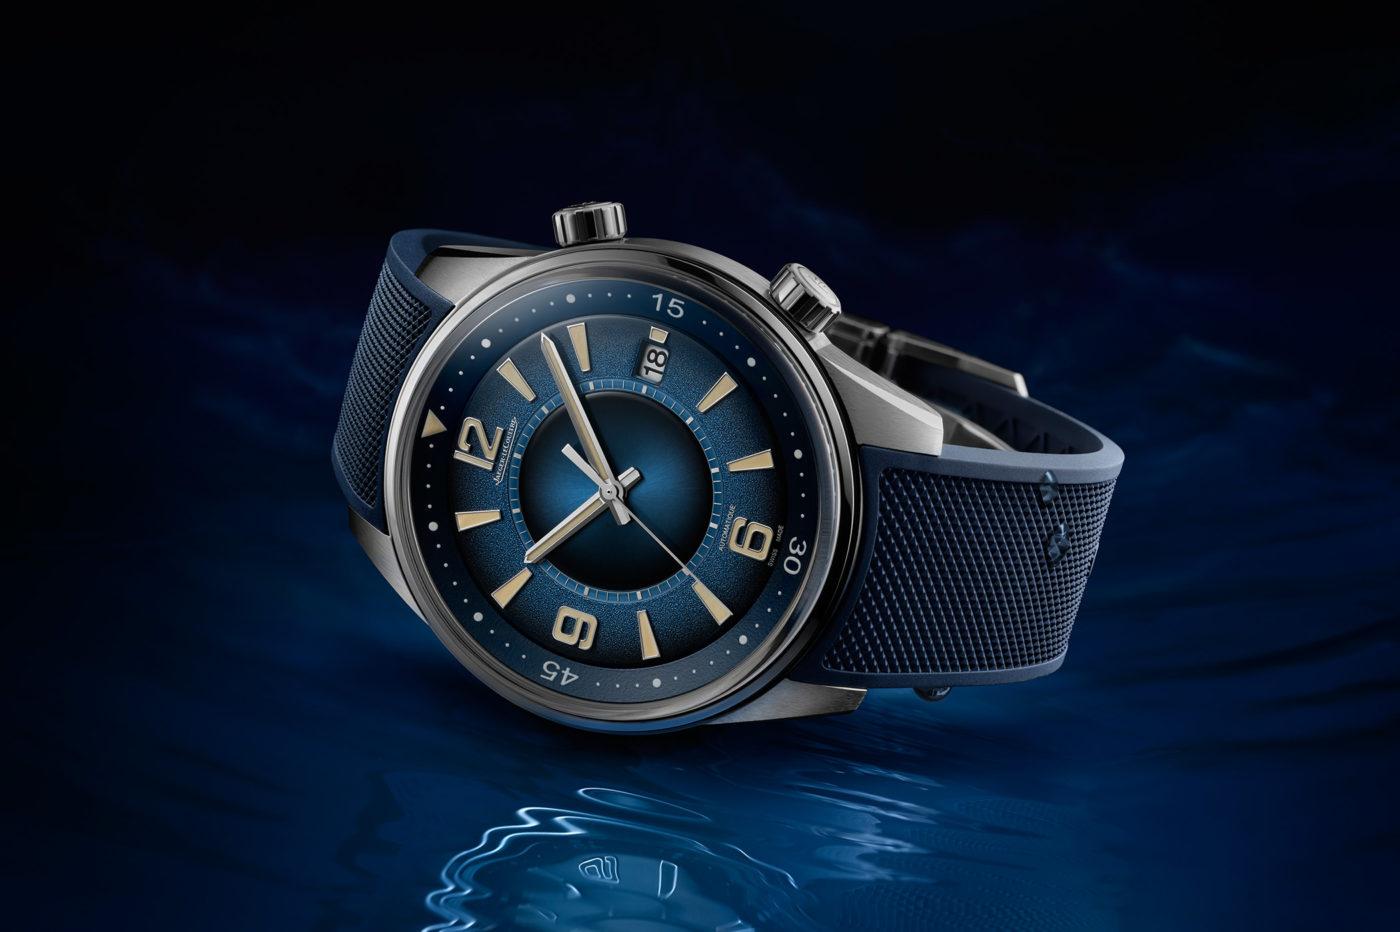 Jaeger-LeCoultre Polaris Date Limited Edition – z niebieską, gradientową tarczą [cena]